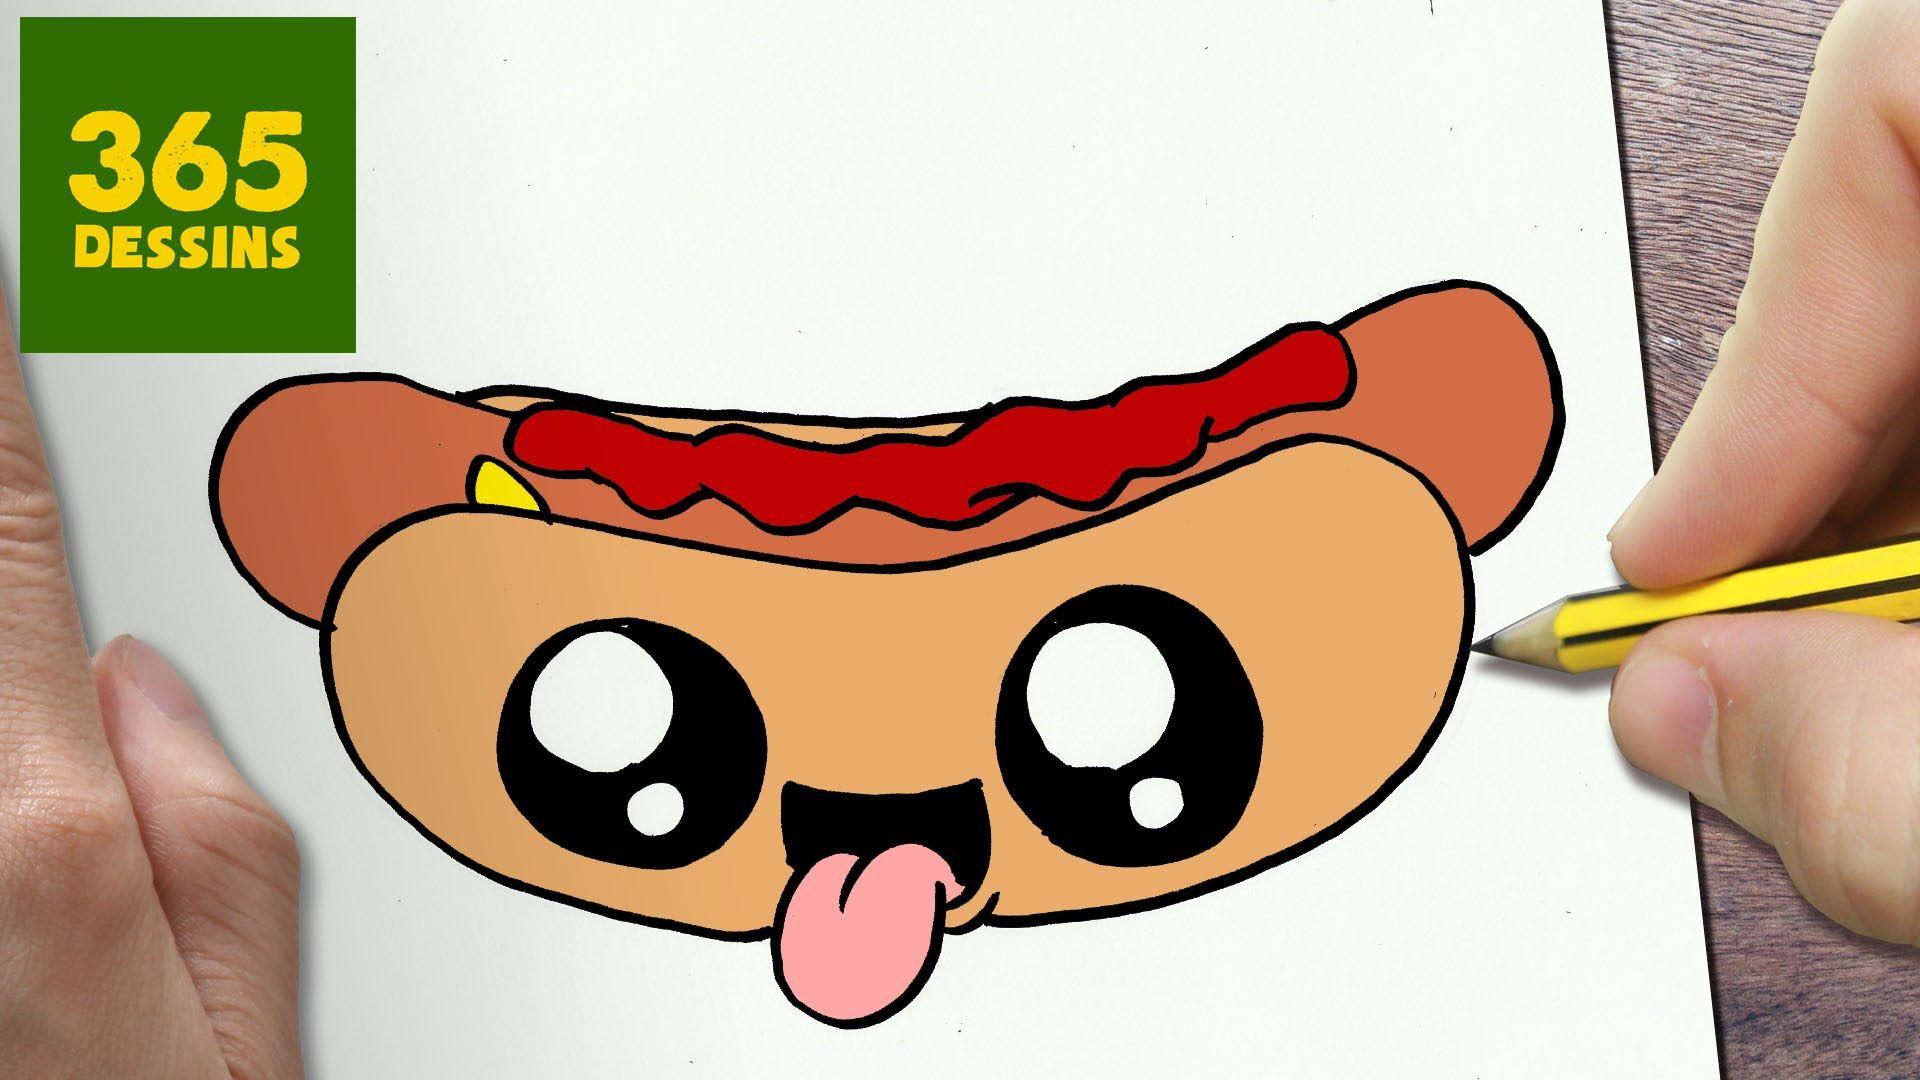 Comment Dessiner Hot Dog Kawaii étape Par étape Dessins